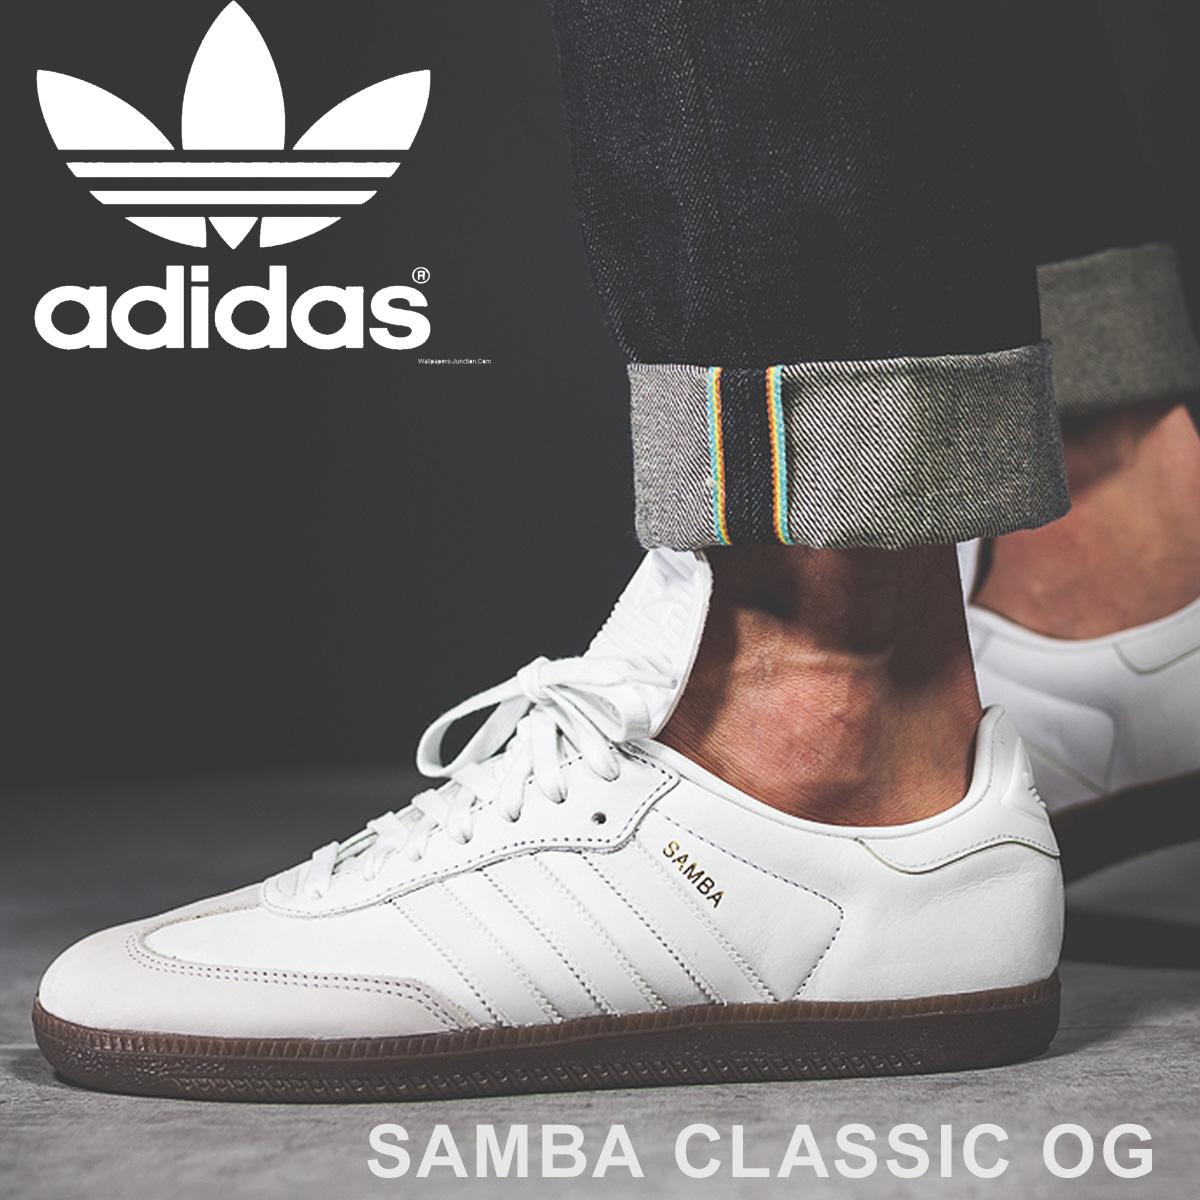 come sportiva rakuten mercato globale: adidas originali samba